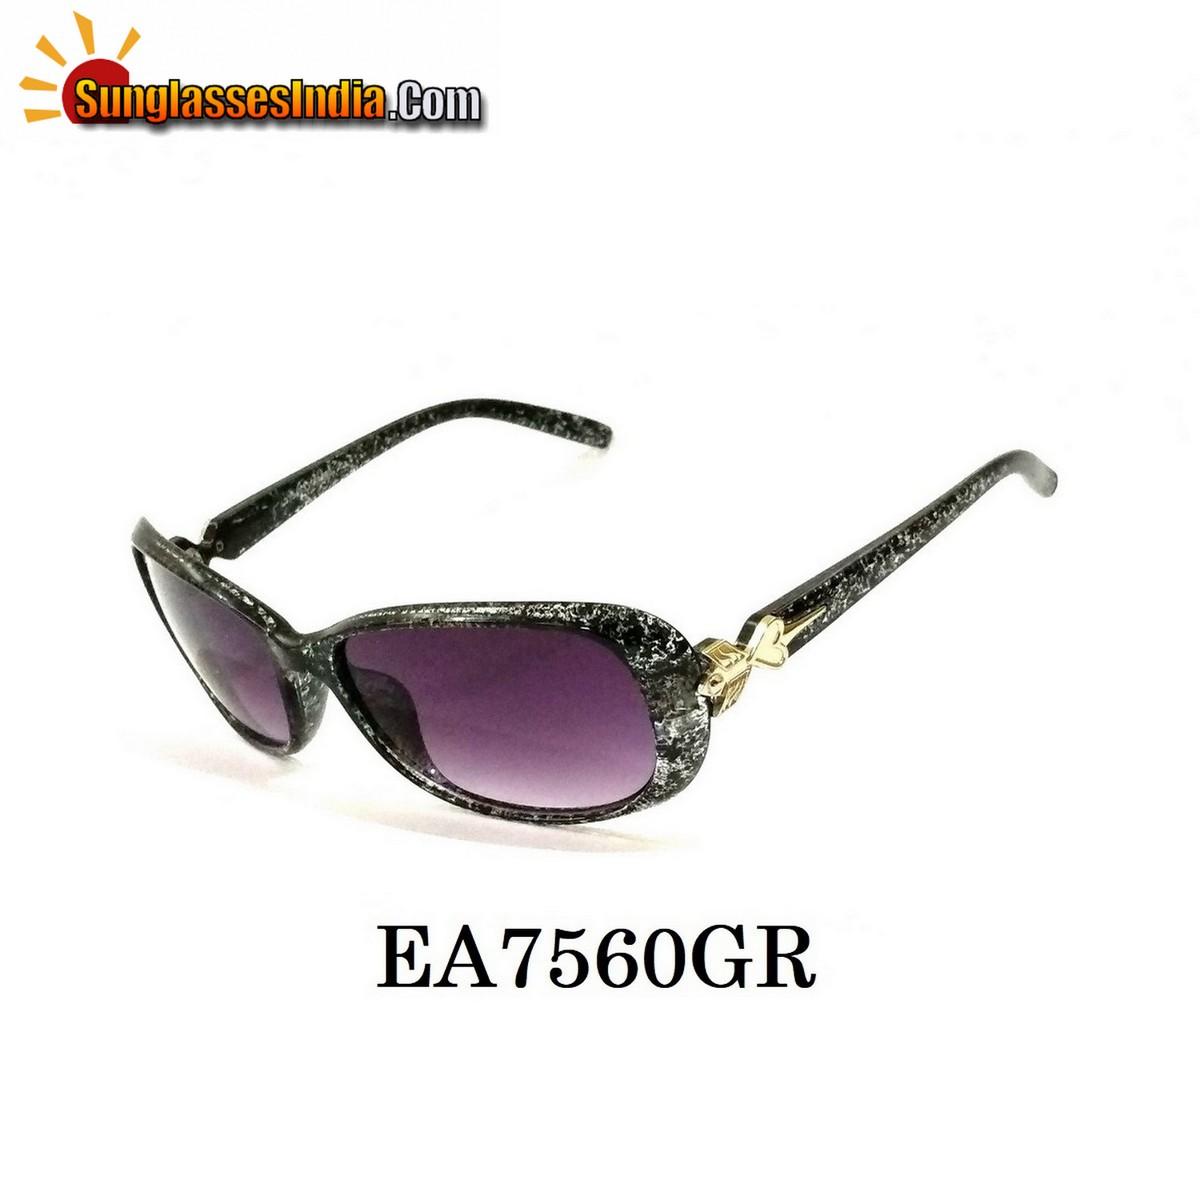 Grey Women Sunglasses EA7560GR